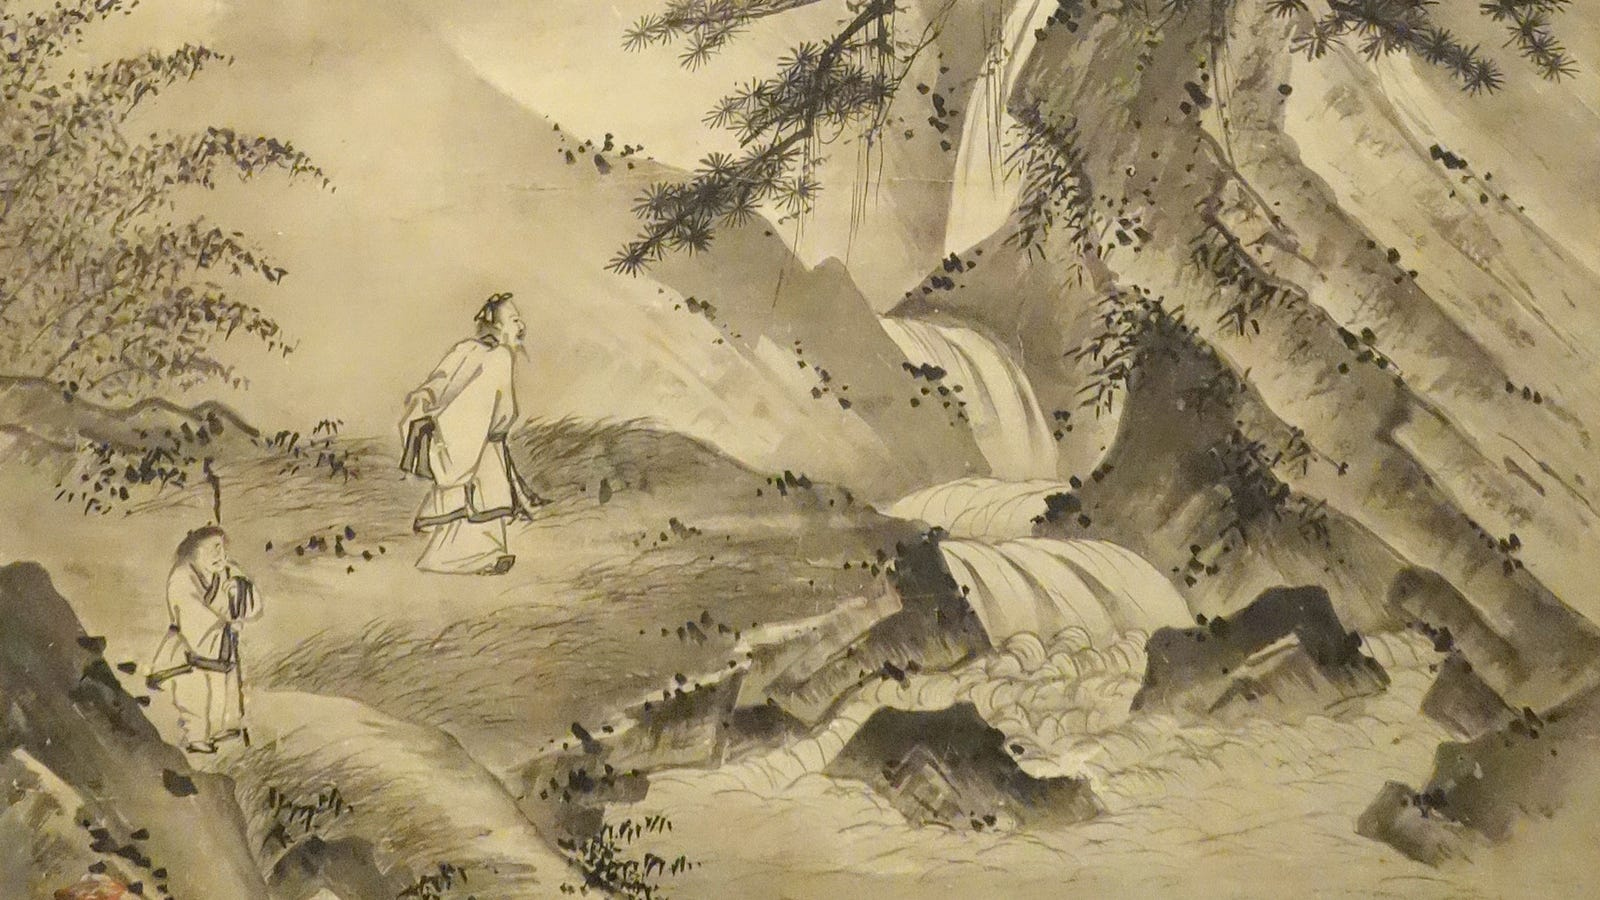 Seven Zen Stories That Could Open Your Mind